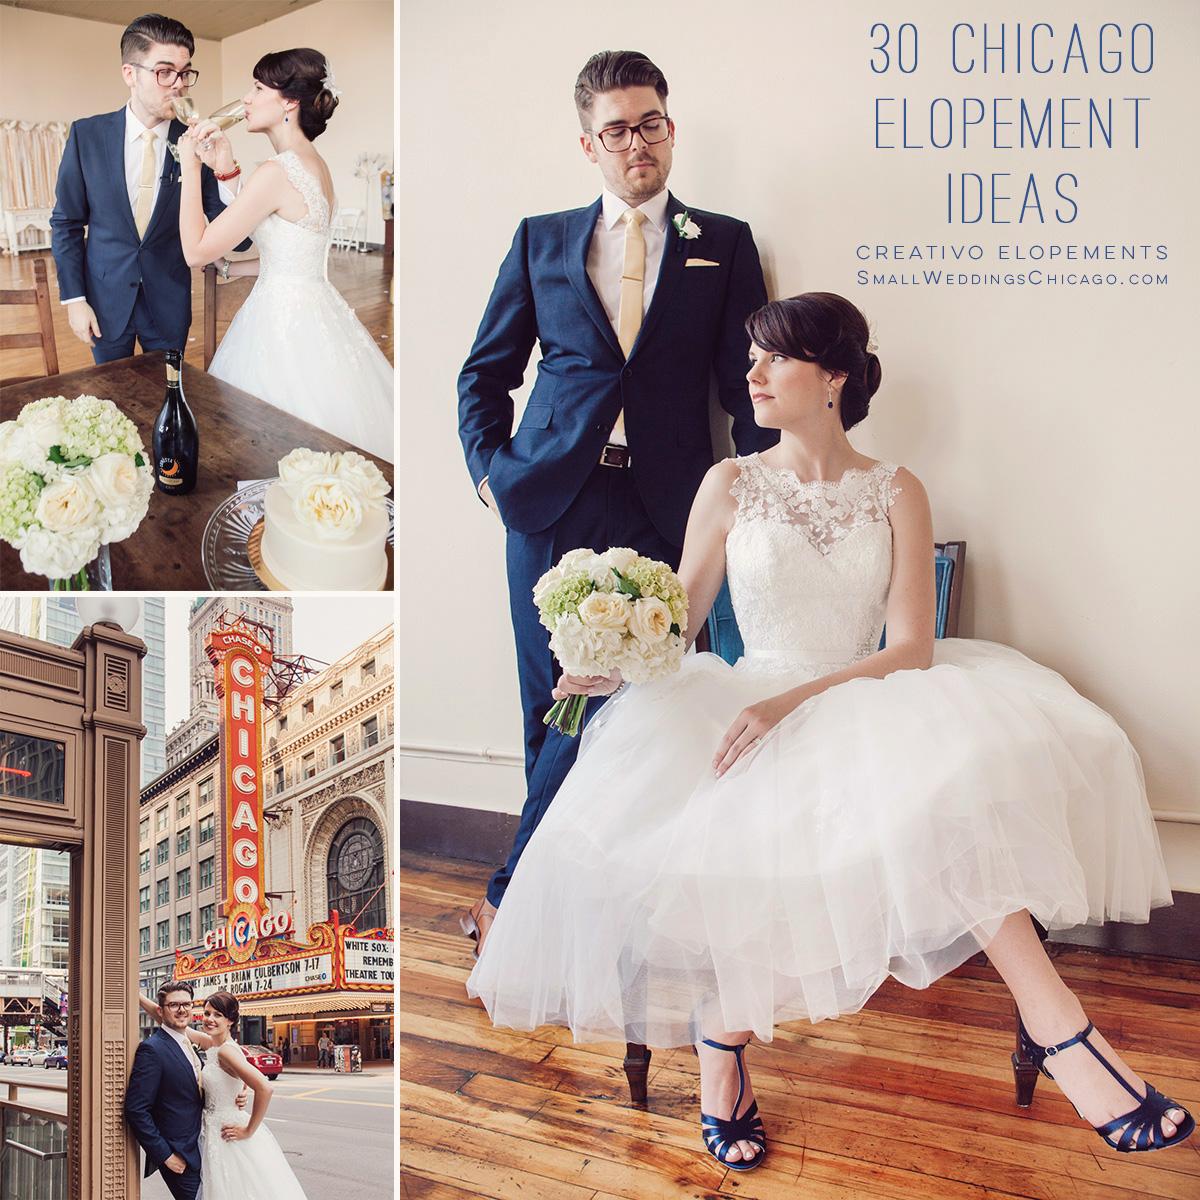 30 Great Elopement Ideas In Chicago